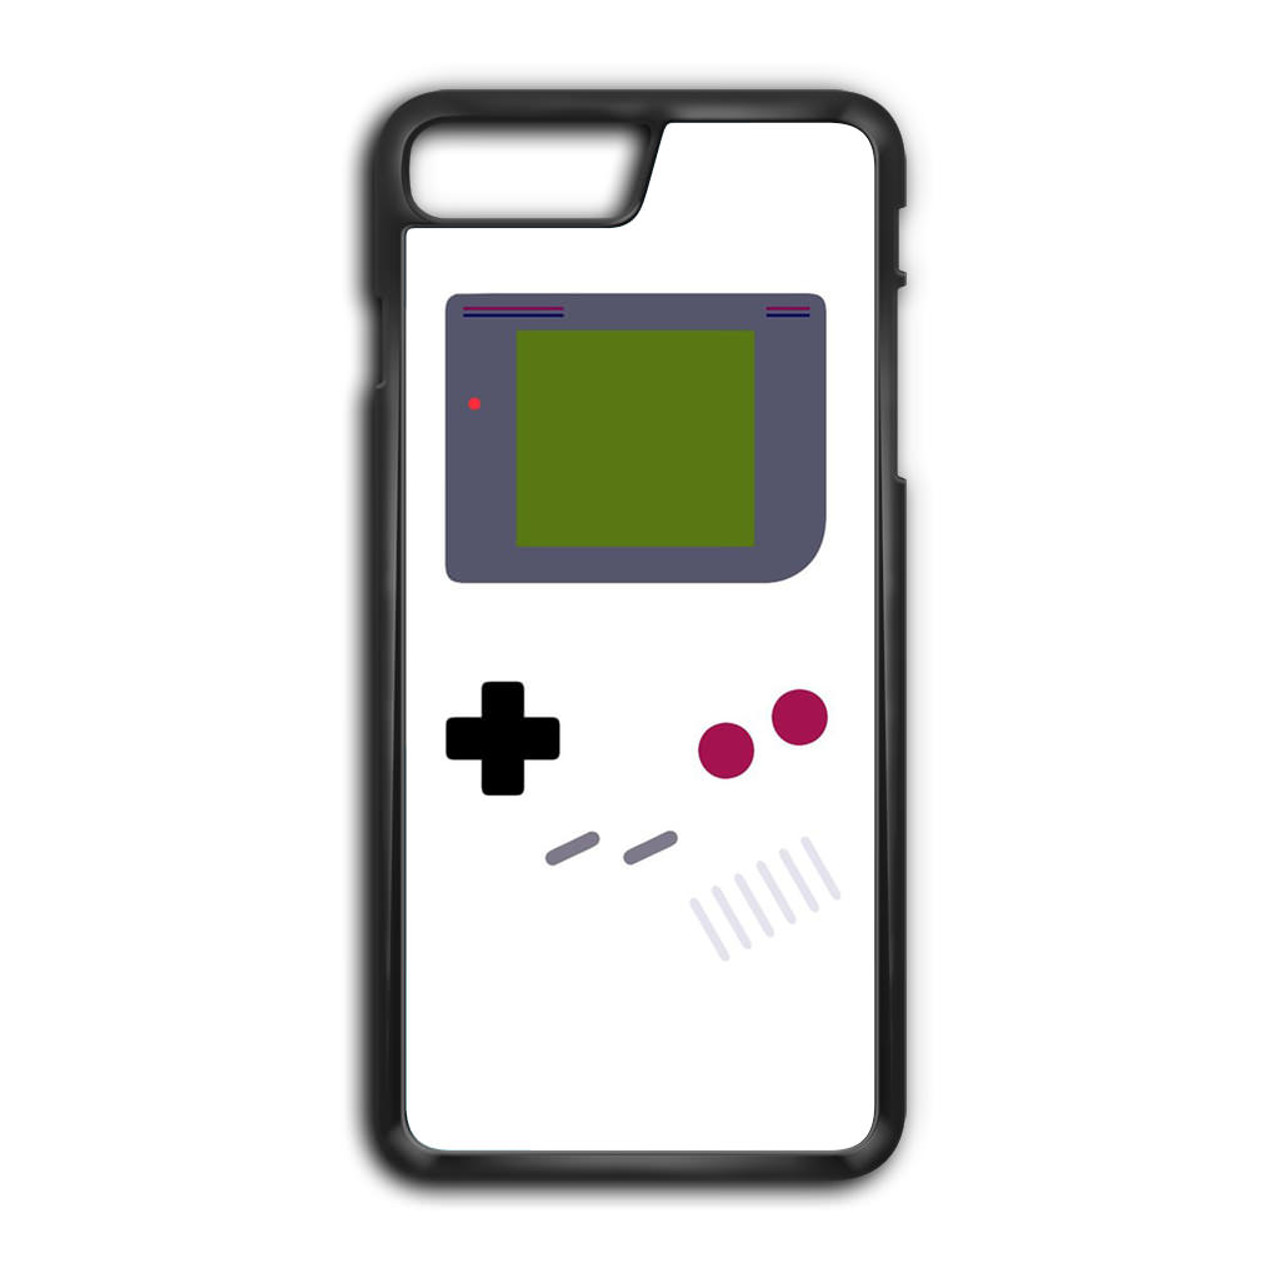 promo code 5b480 7c0cf Game Boy Minimalism iPhone 8 Plus Case